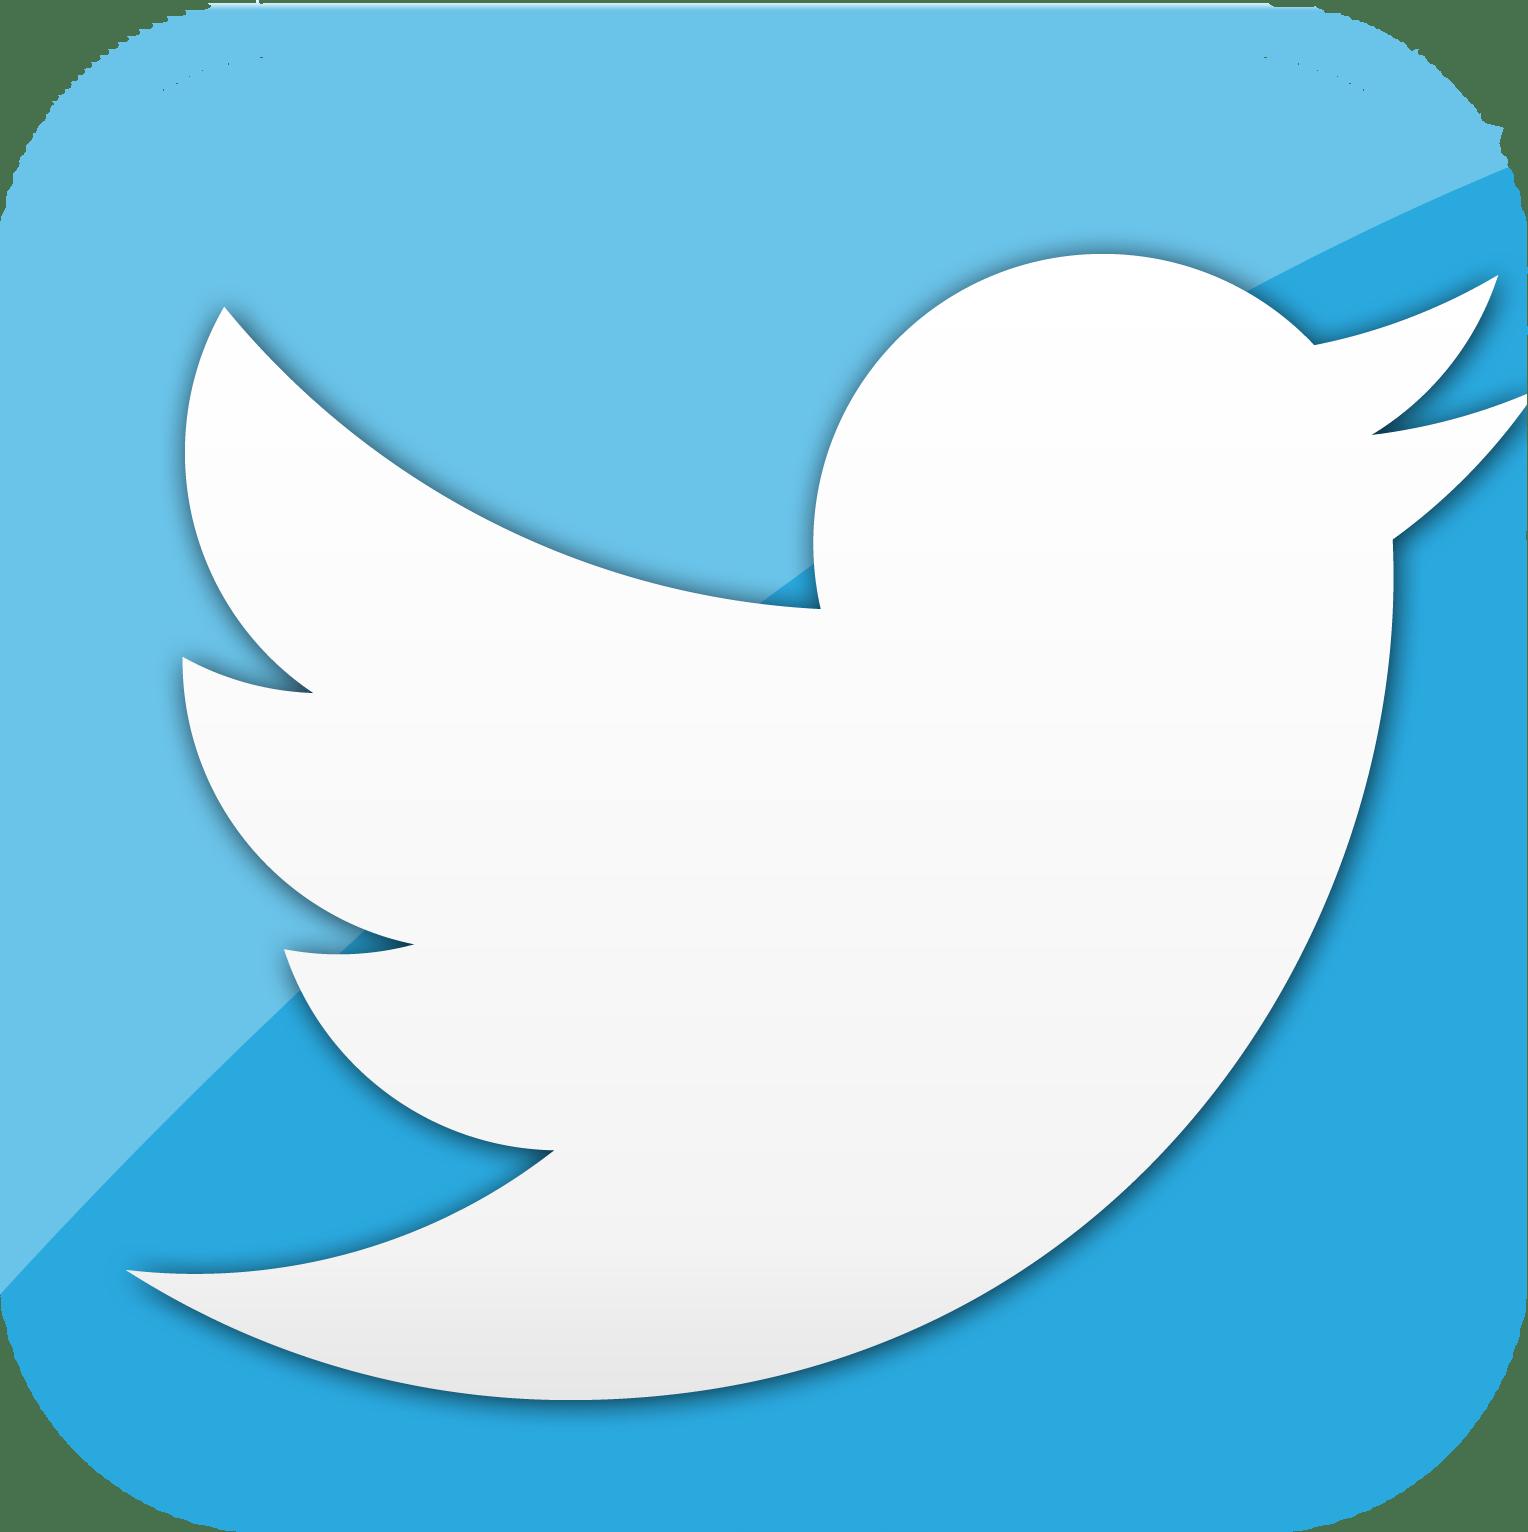 TwitterBird: the-digital-reader.com/2015/06/21/penguin-random-house-now-selling...